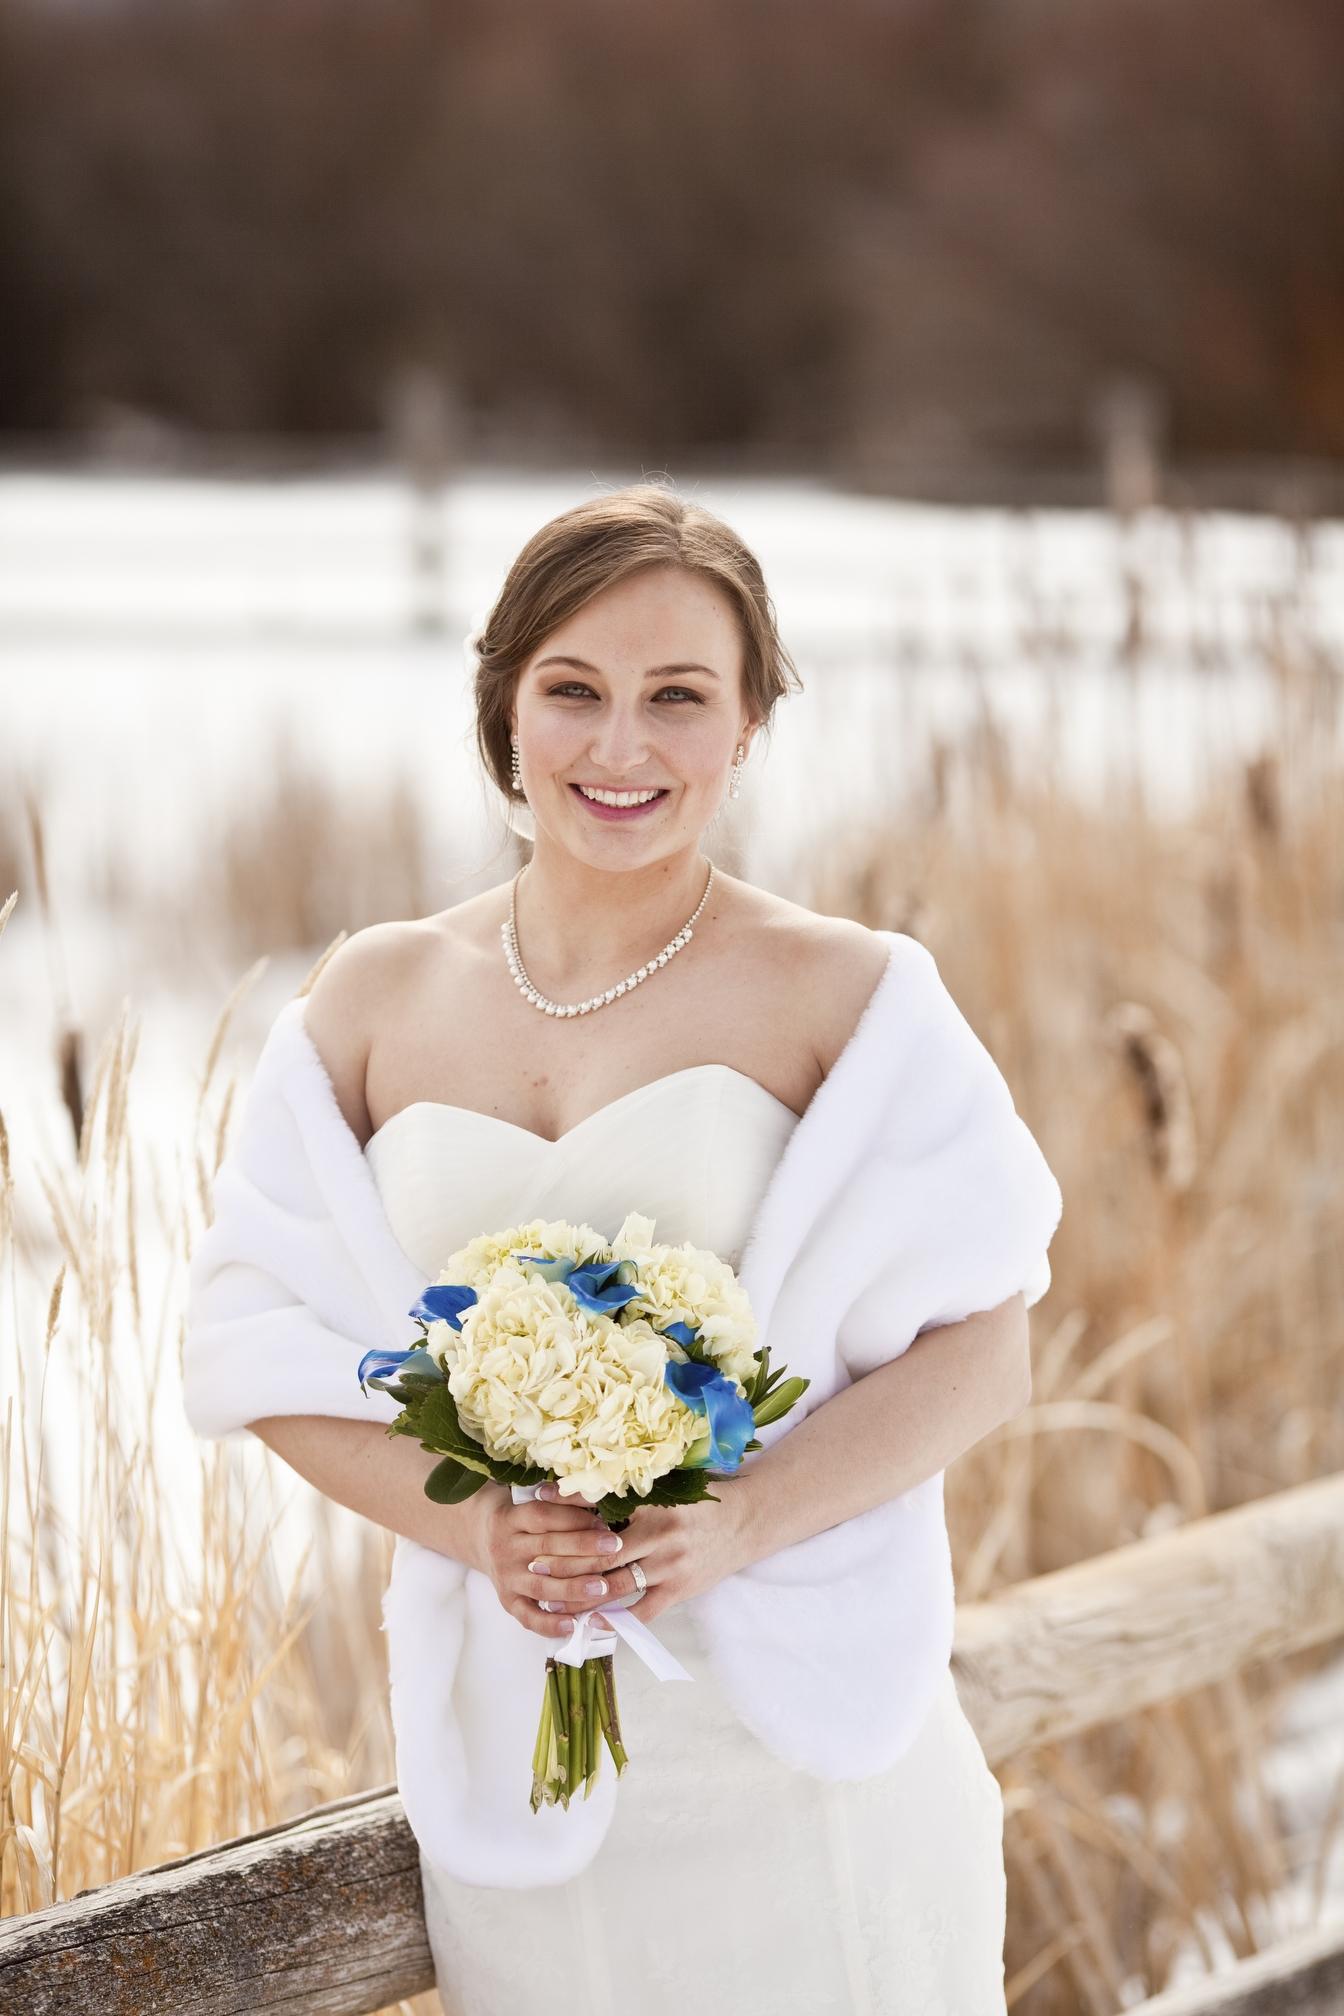 O'Neil Jackson Hole Wedding 2013_0114.JPG